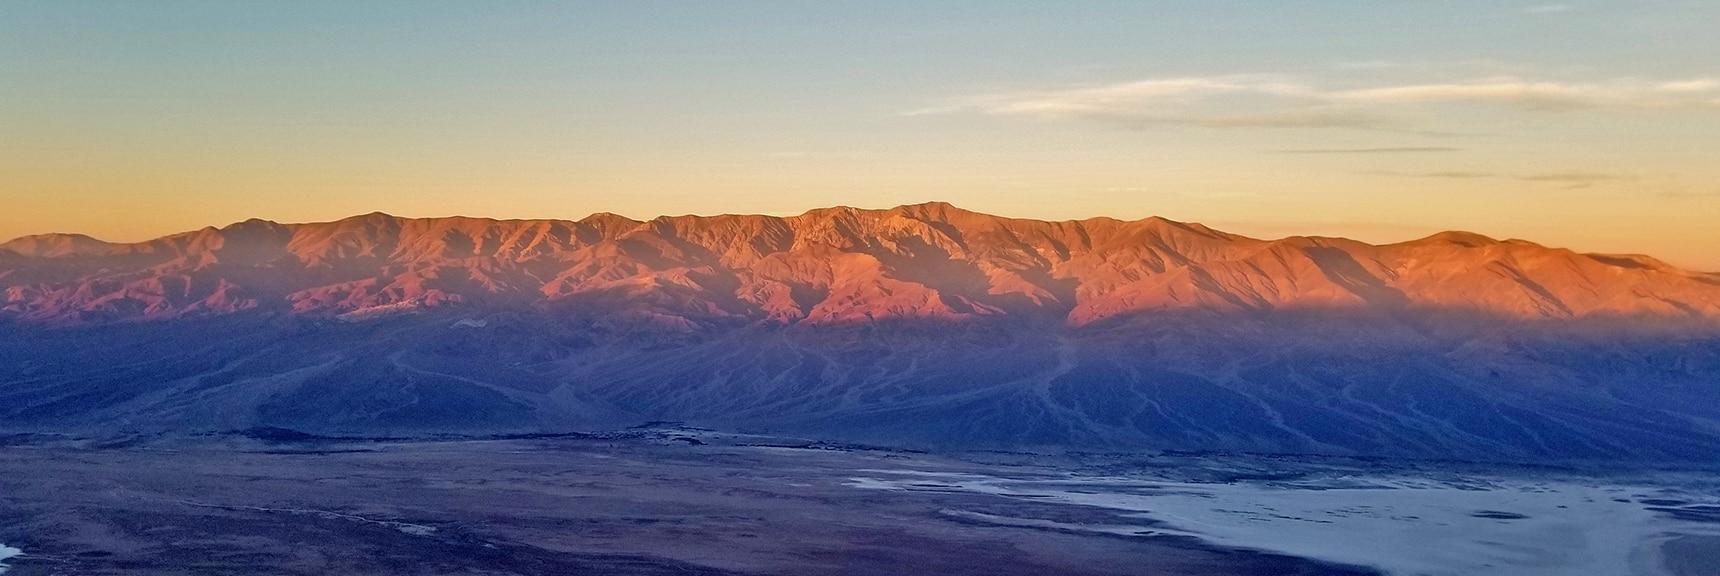 Telescope Peak Sunrise from Dante's View   Death Valley National Park, California